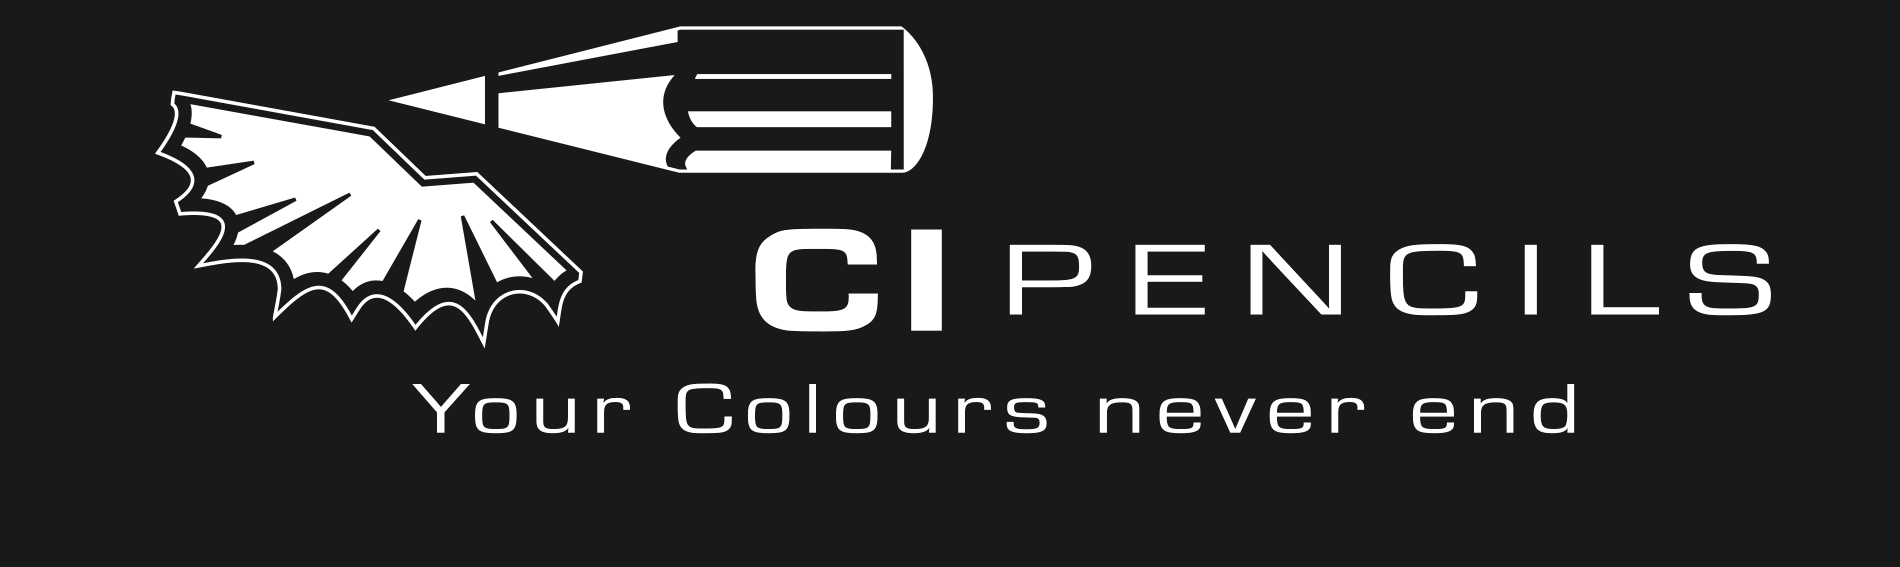 CI Pencils